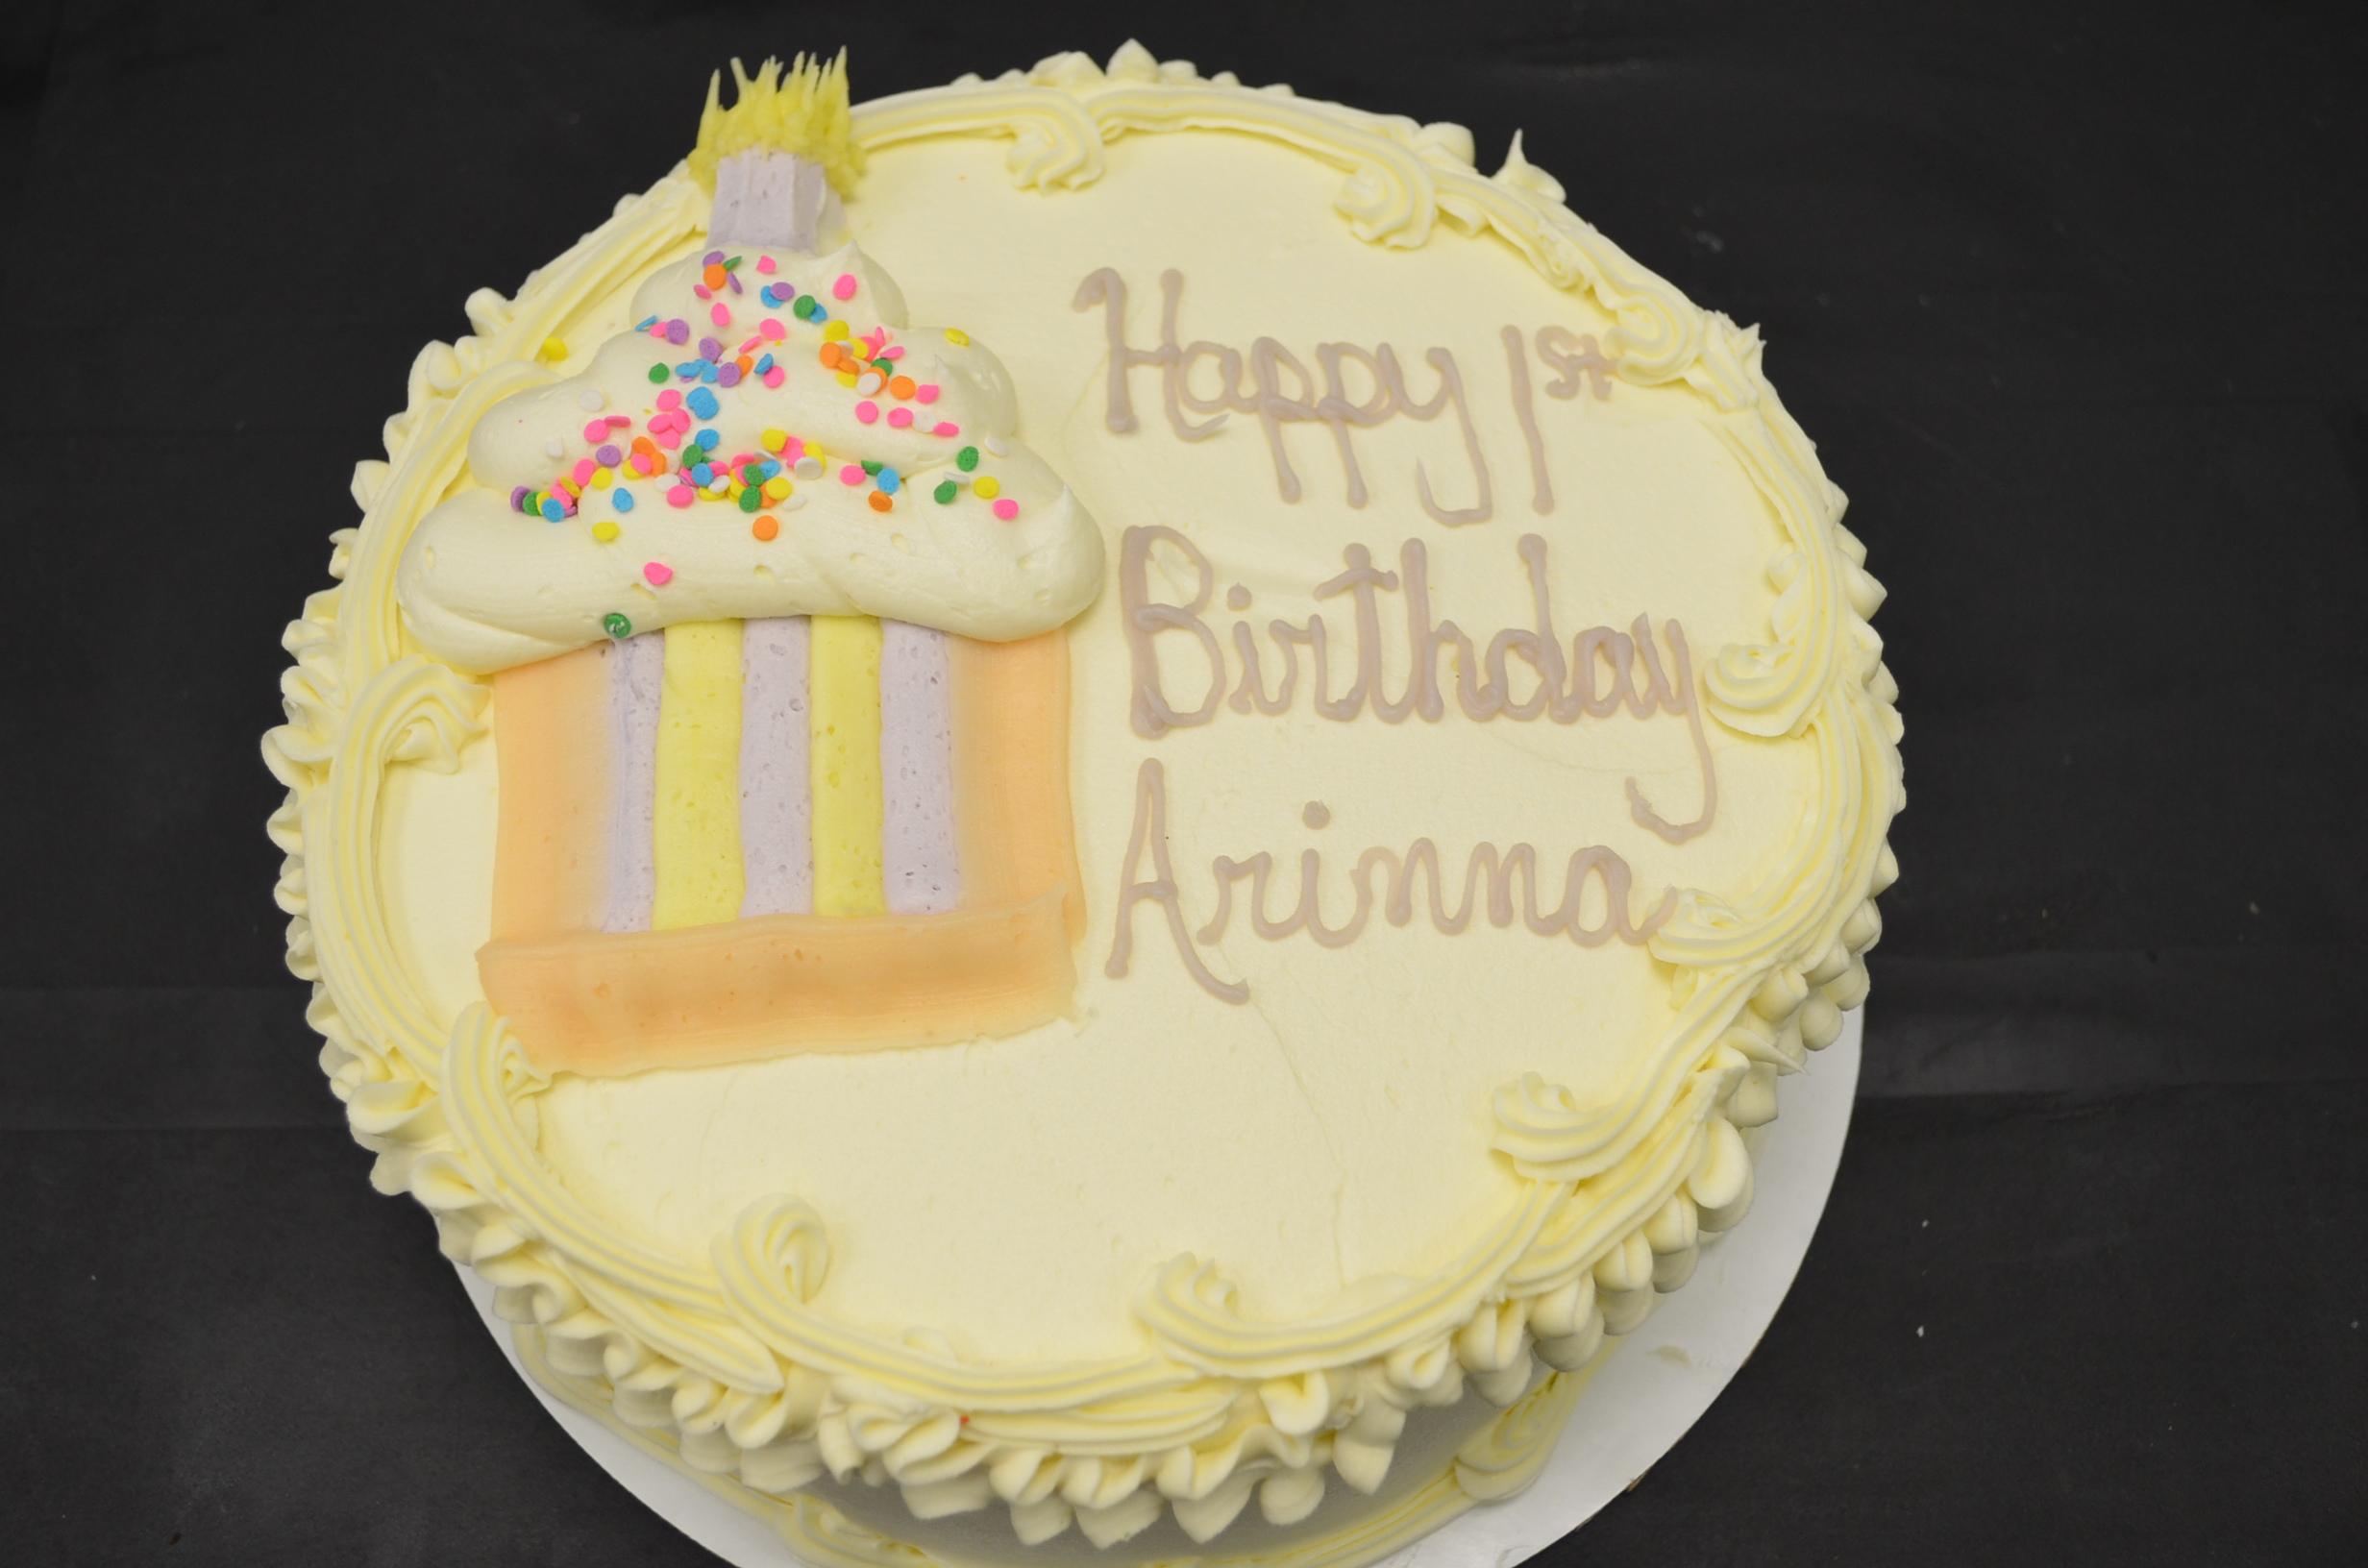 Pastel Cupcake - The Cake Shop | Cupcakes | Wedding Cakes | Bakery